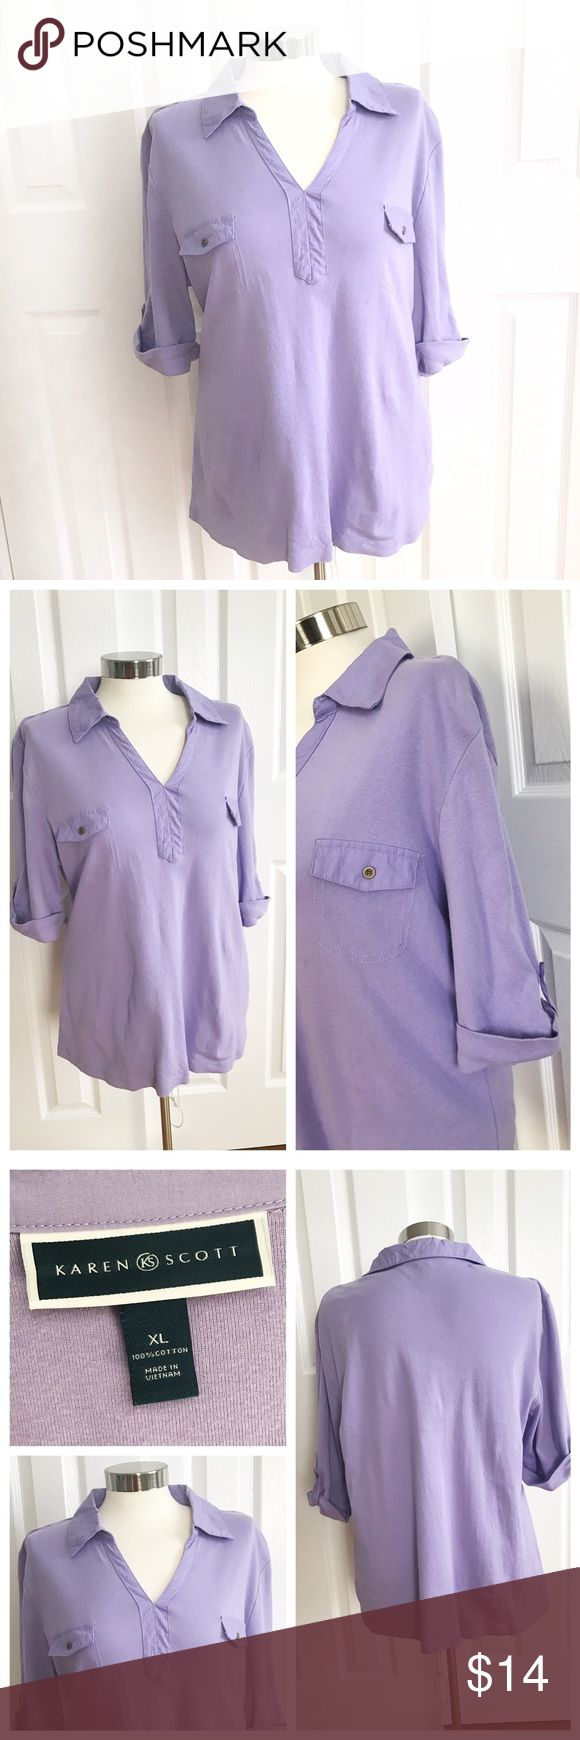 Karen Scott Lavender 3/4 Sleeve Top Lavender purple 3/4 sleeve shirt. Collar, pockets. 100% cotton. Karen Scott brand. Size XL. Karen Scott Tops